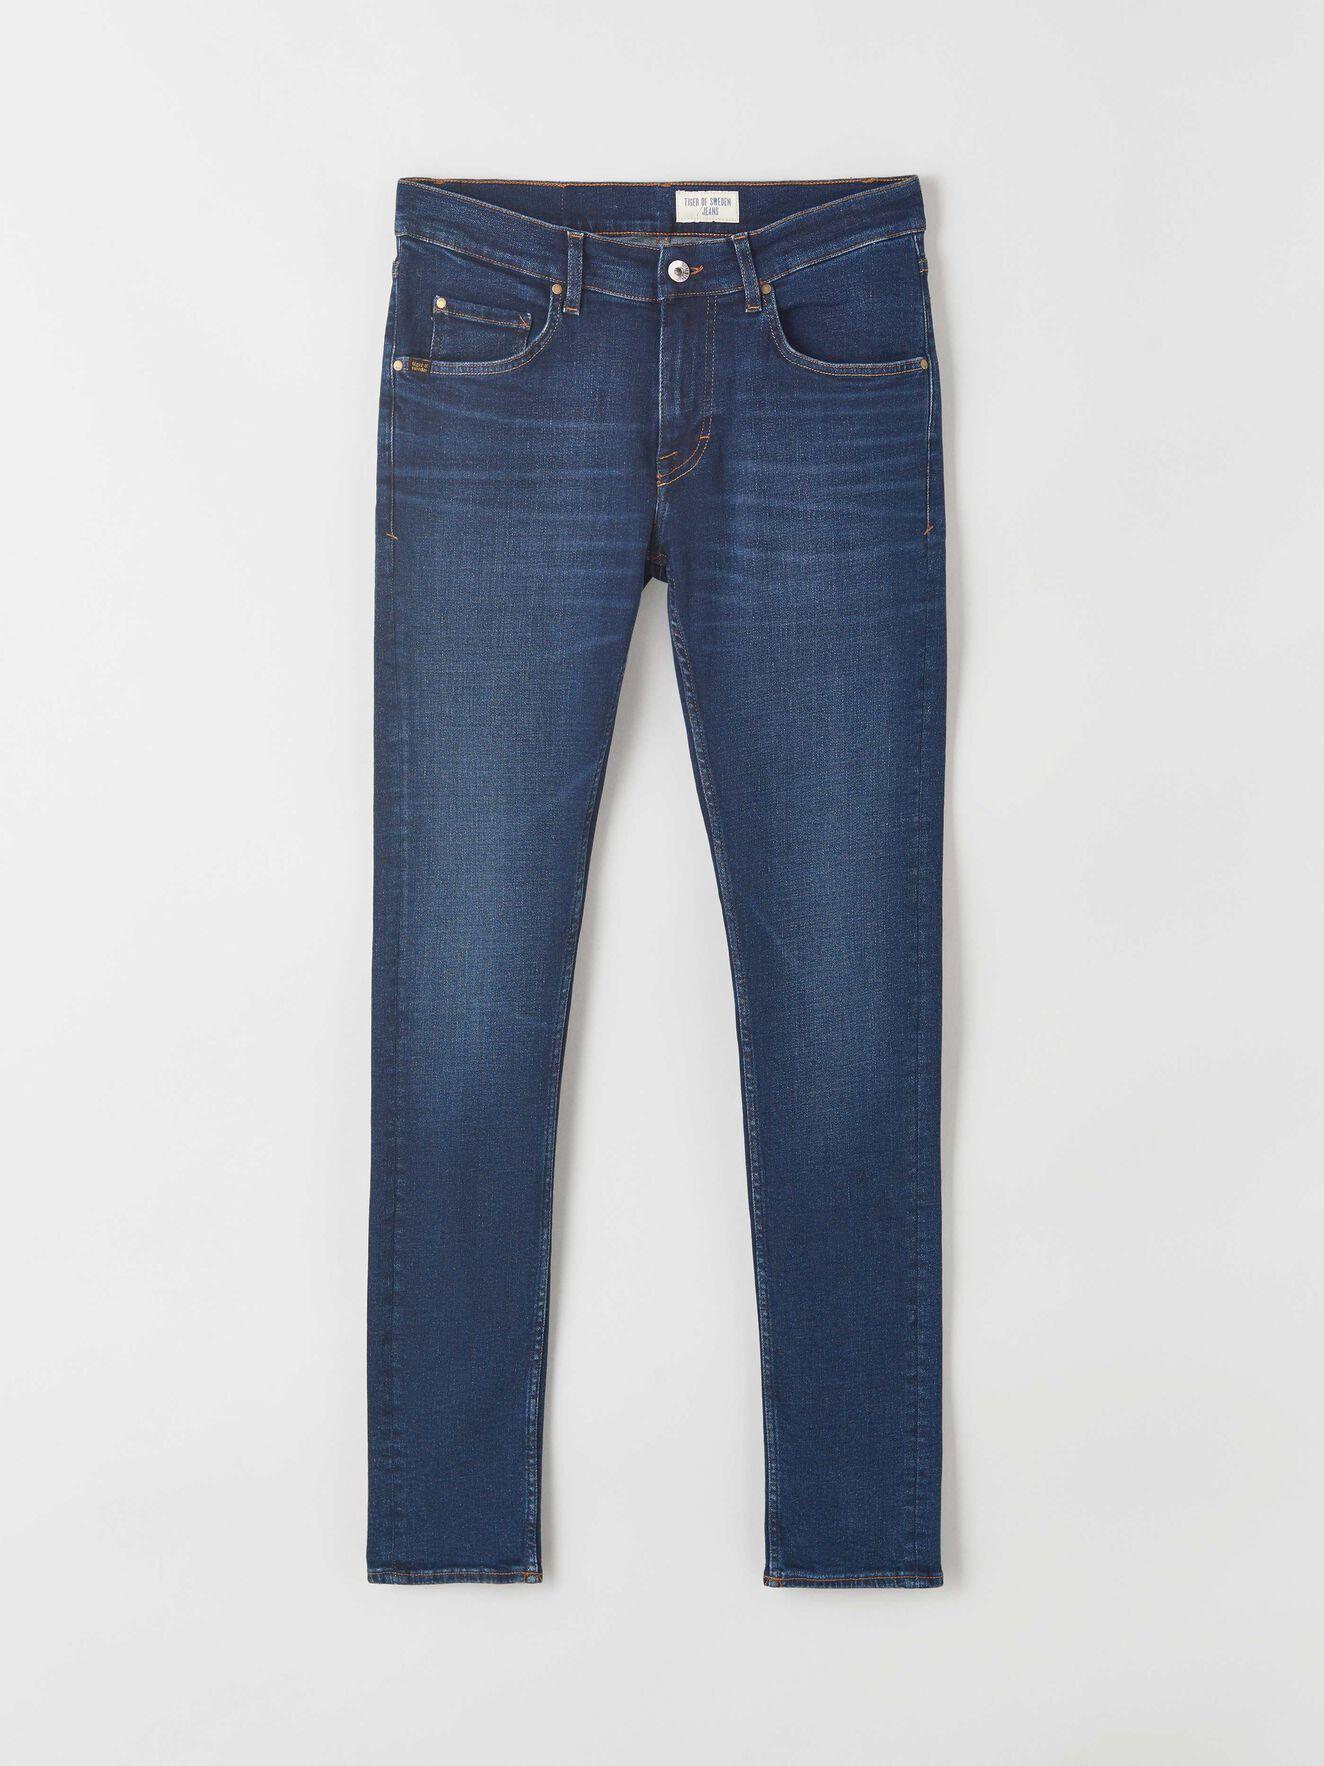 the latest 3f744 0c8ab Jeans - Shop men's jeans online at Tiger of Sweden